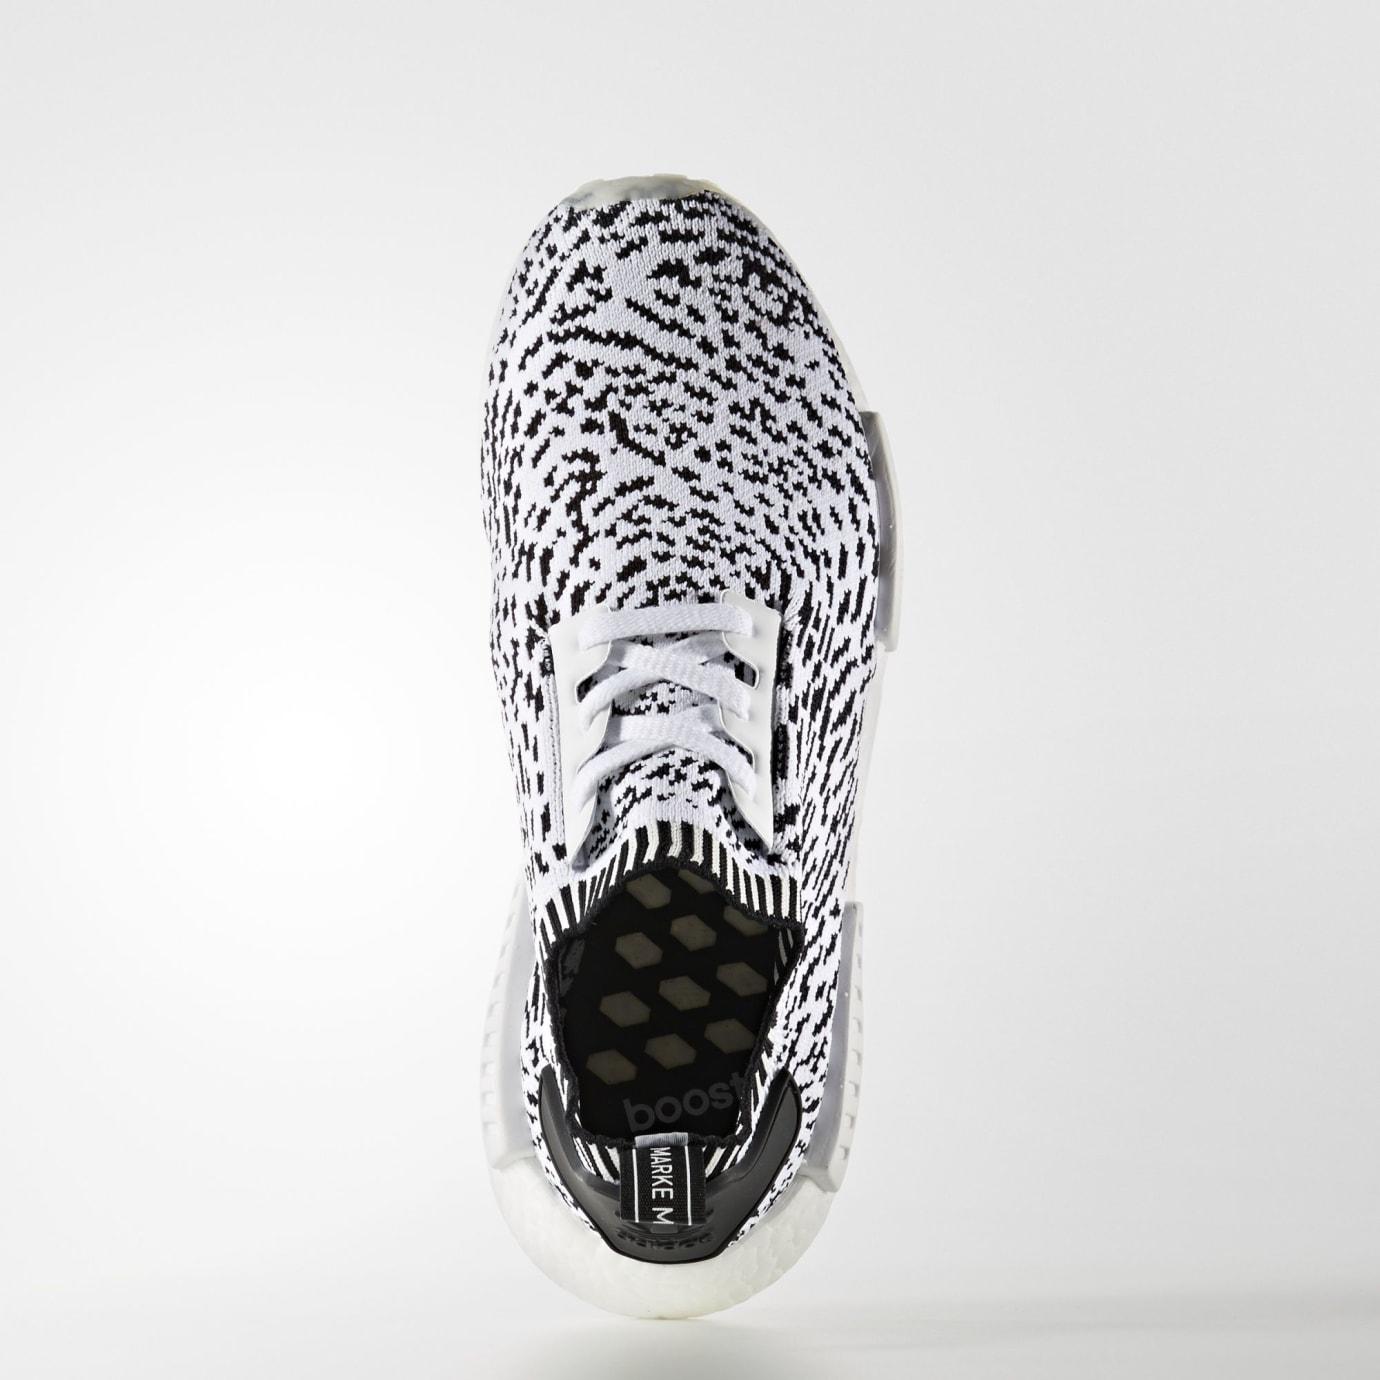 073cbfe0f1aca Adidas NMD R1   NMD City Sock 2  Sashiko  Pack Release Date BZ0219 ...